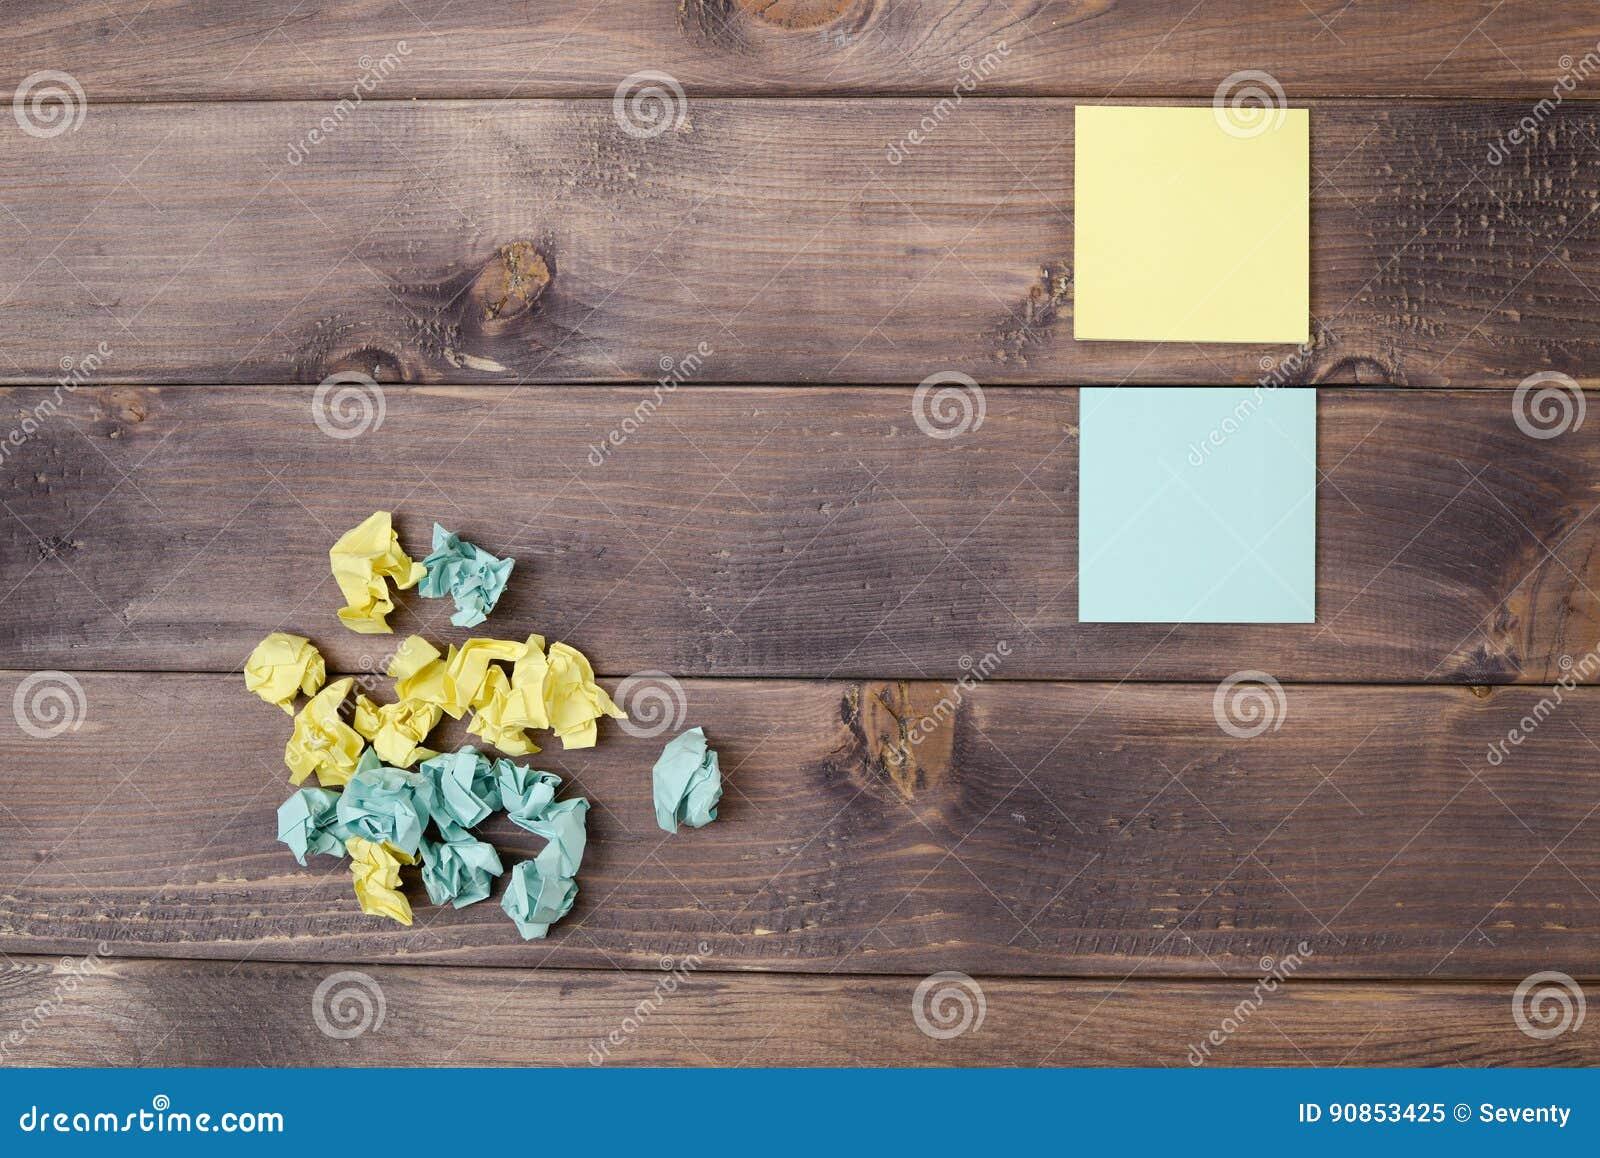 Stationery.scratch paper.beige纸覆盖.grunge老纸design.stack